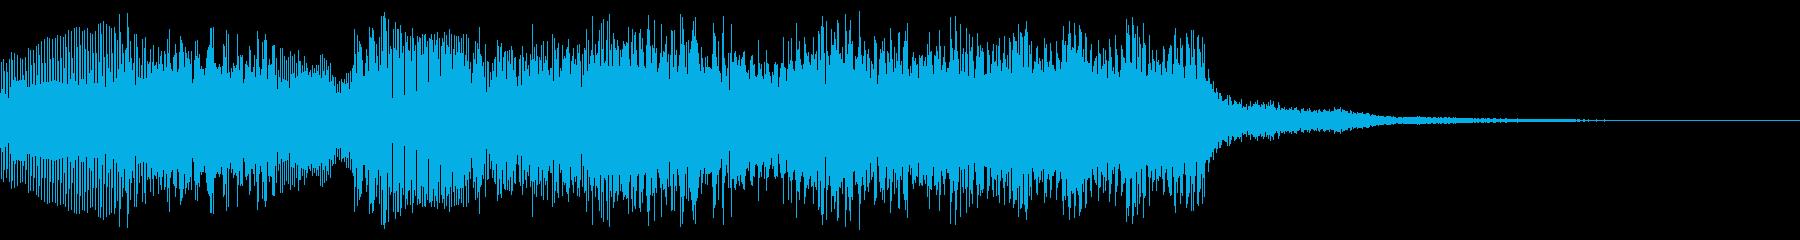 8bit ファミコン風 クリア、場面転換の再生済みの波形